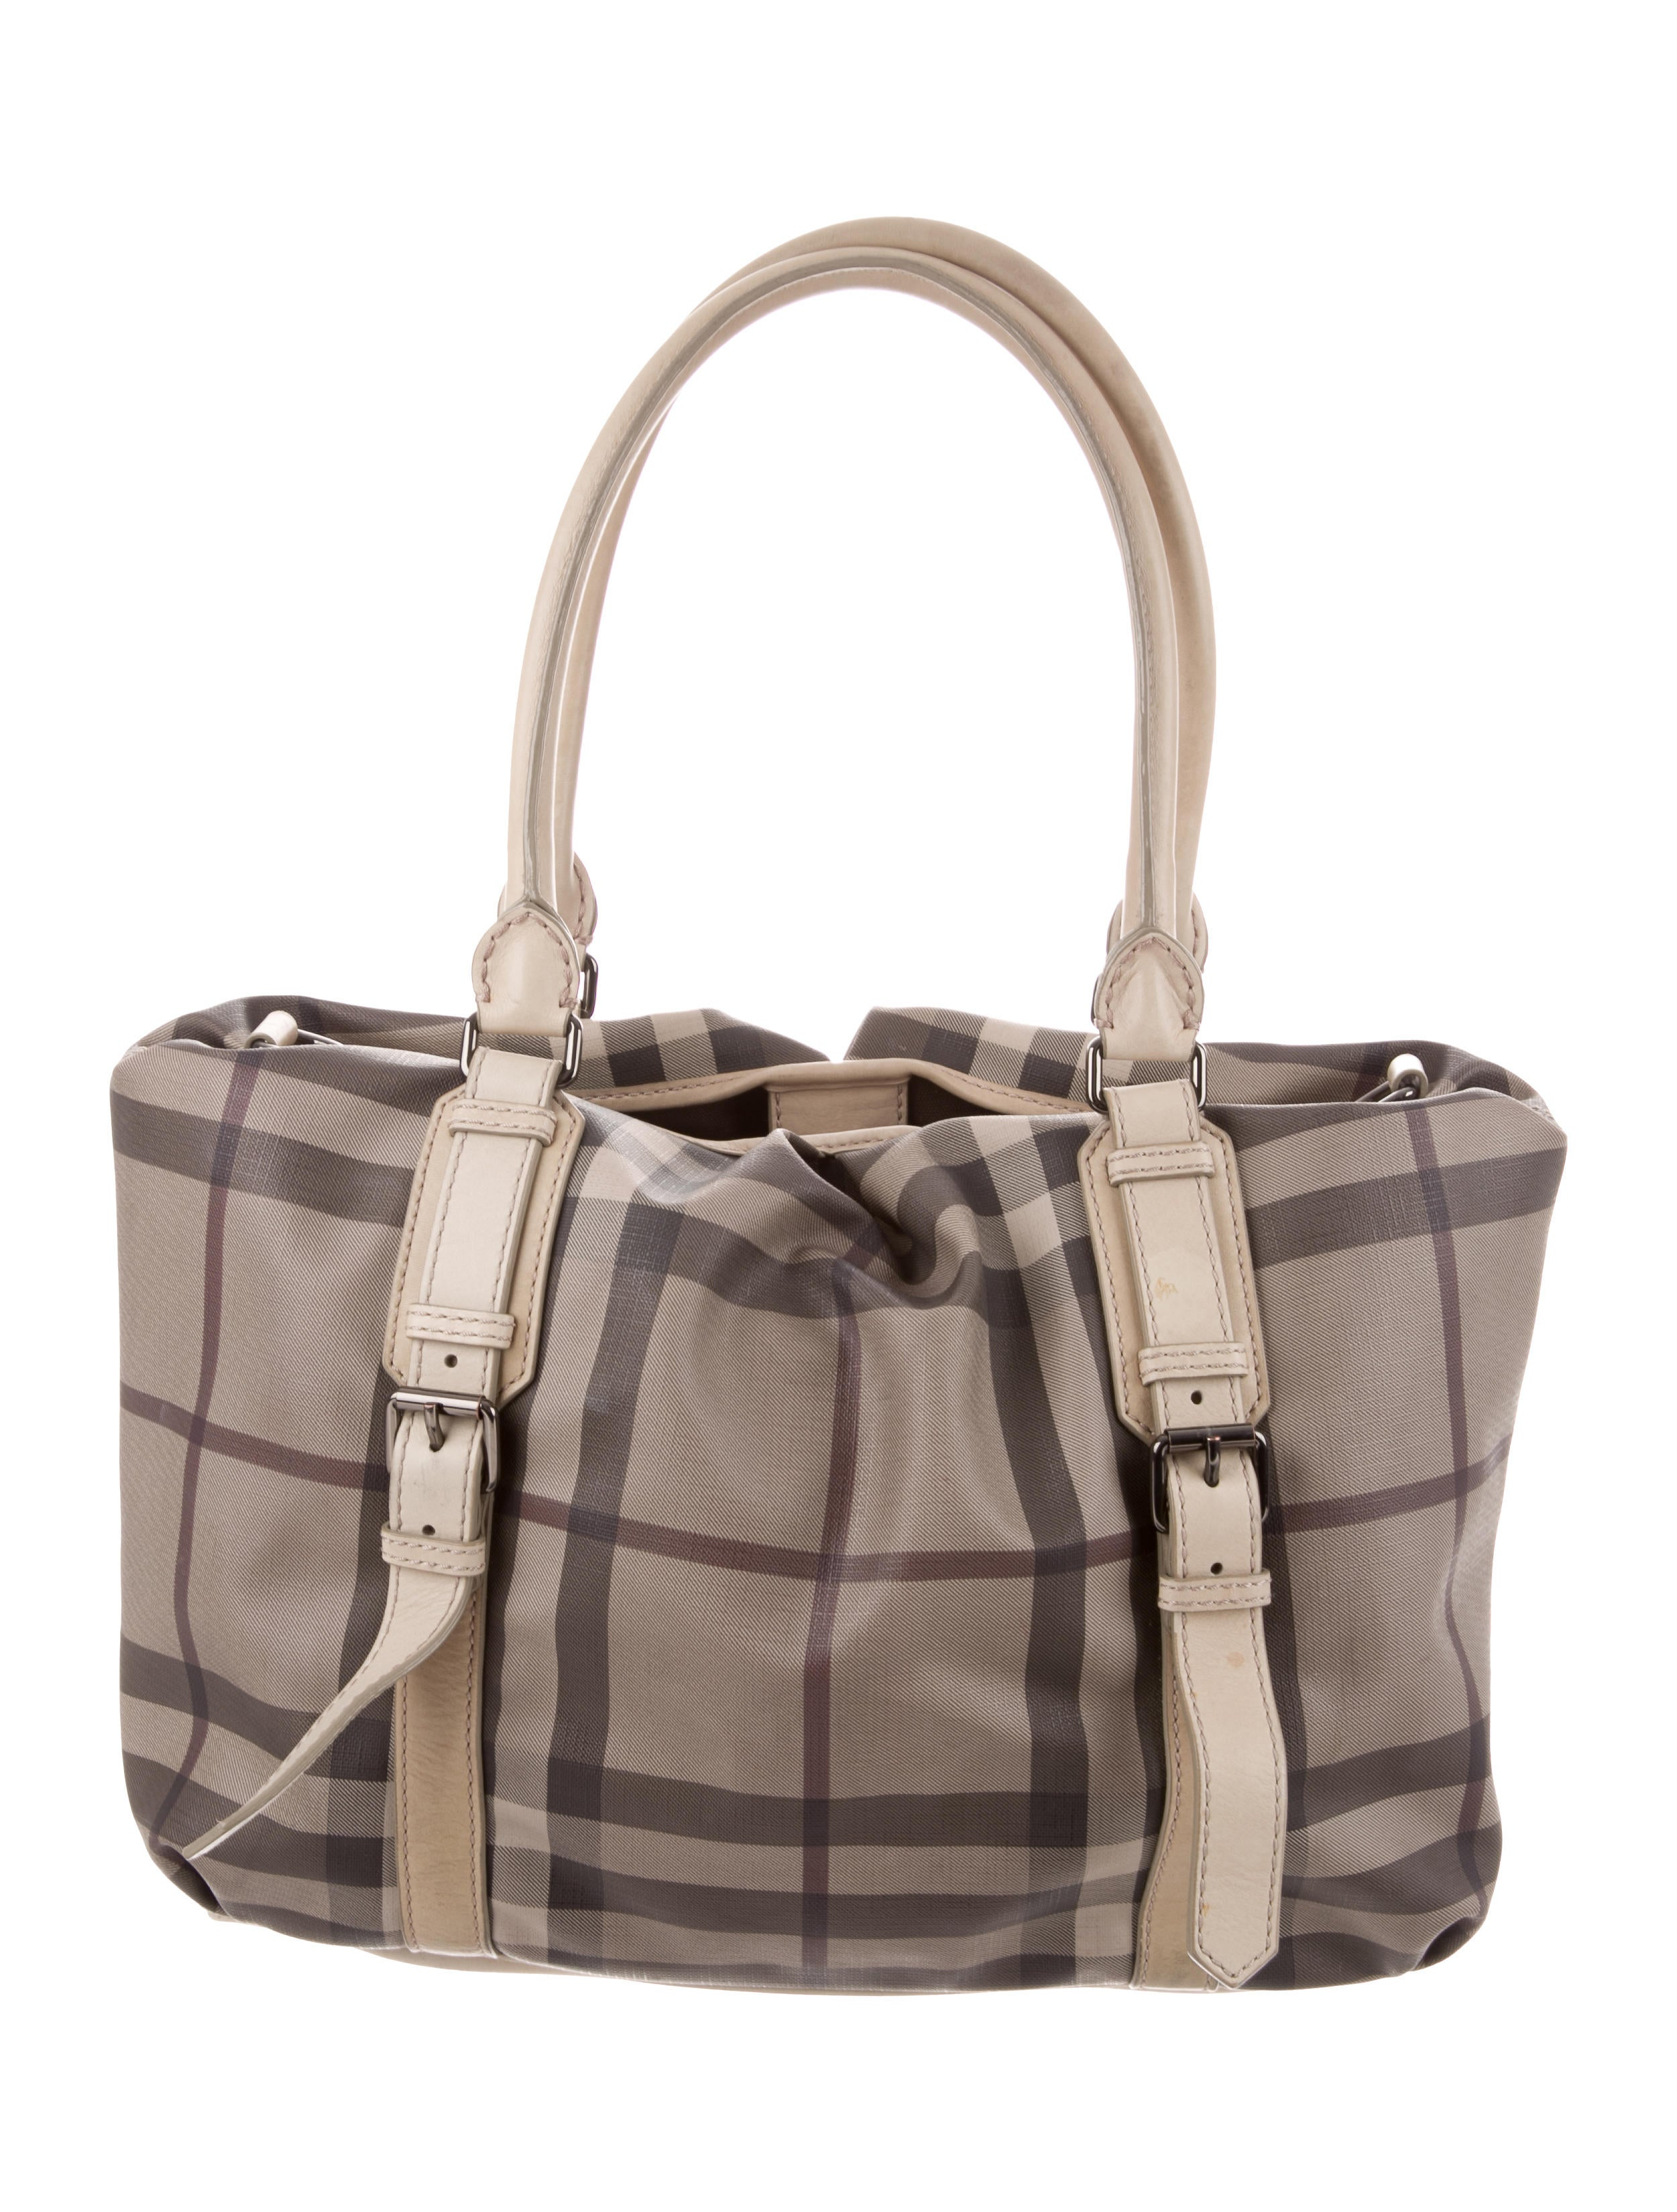 01259b29588b Burberry Smoked Check Northfield Tote - Handbags - BUR89209